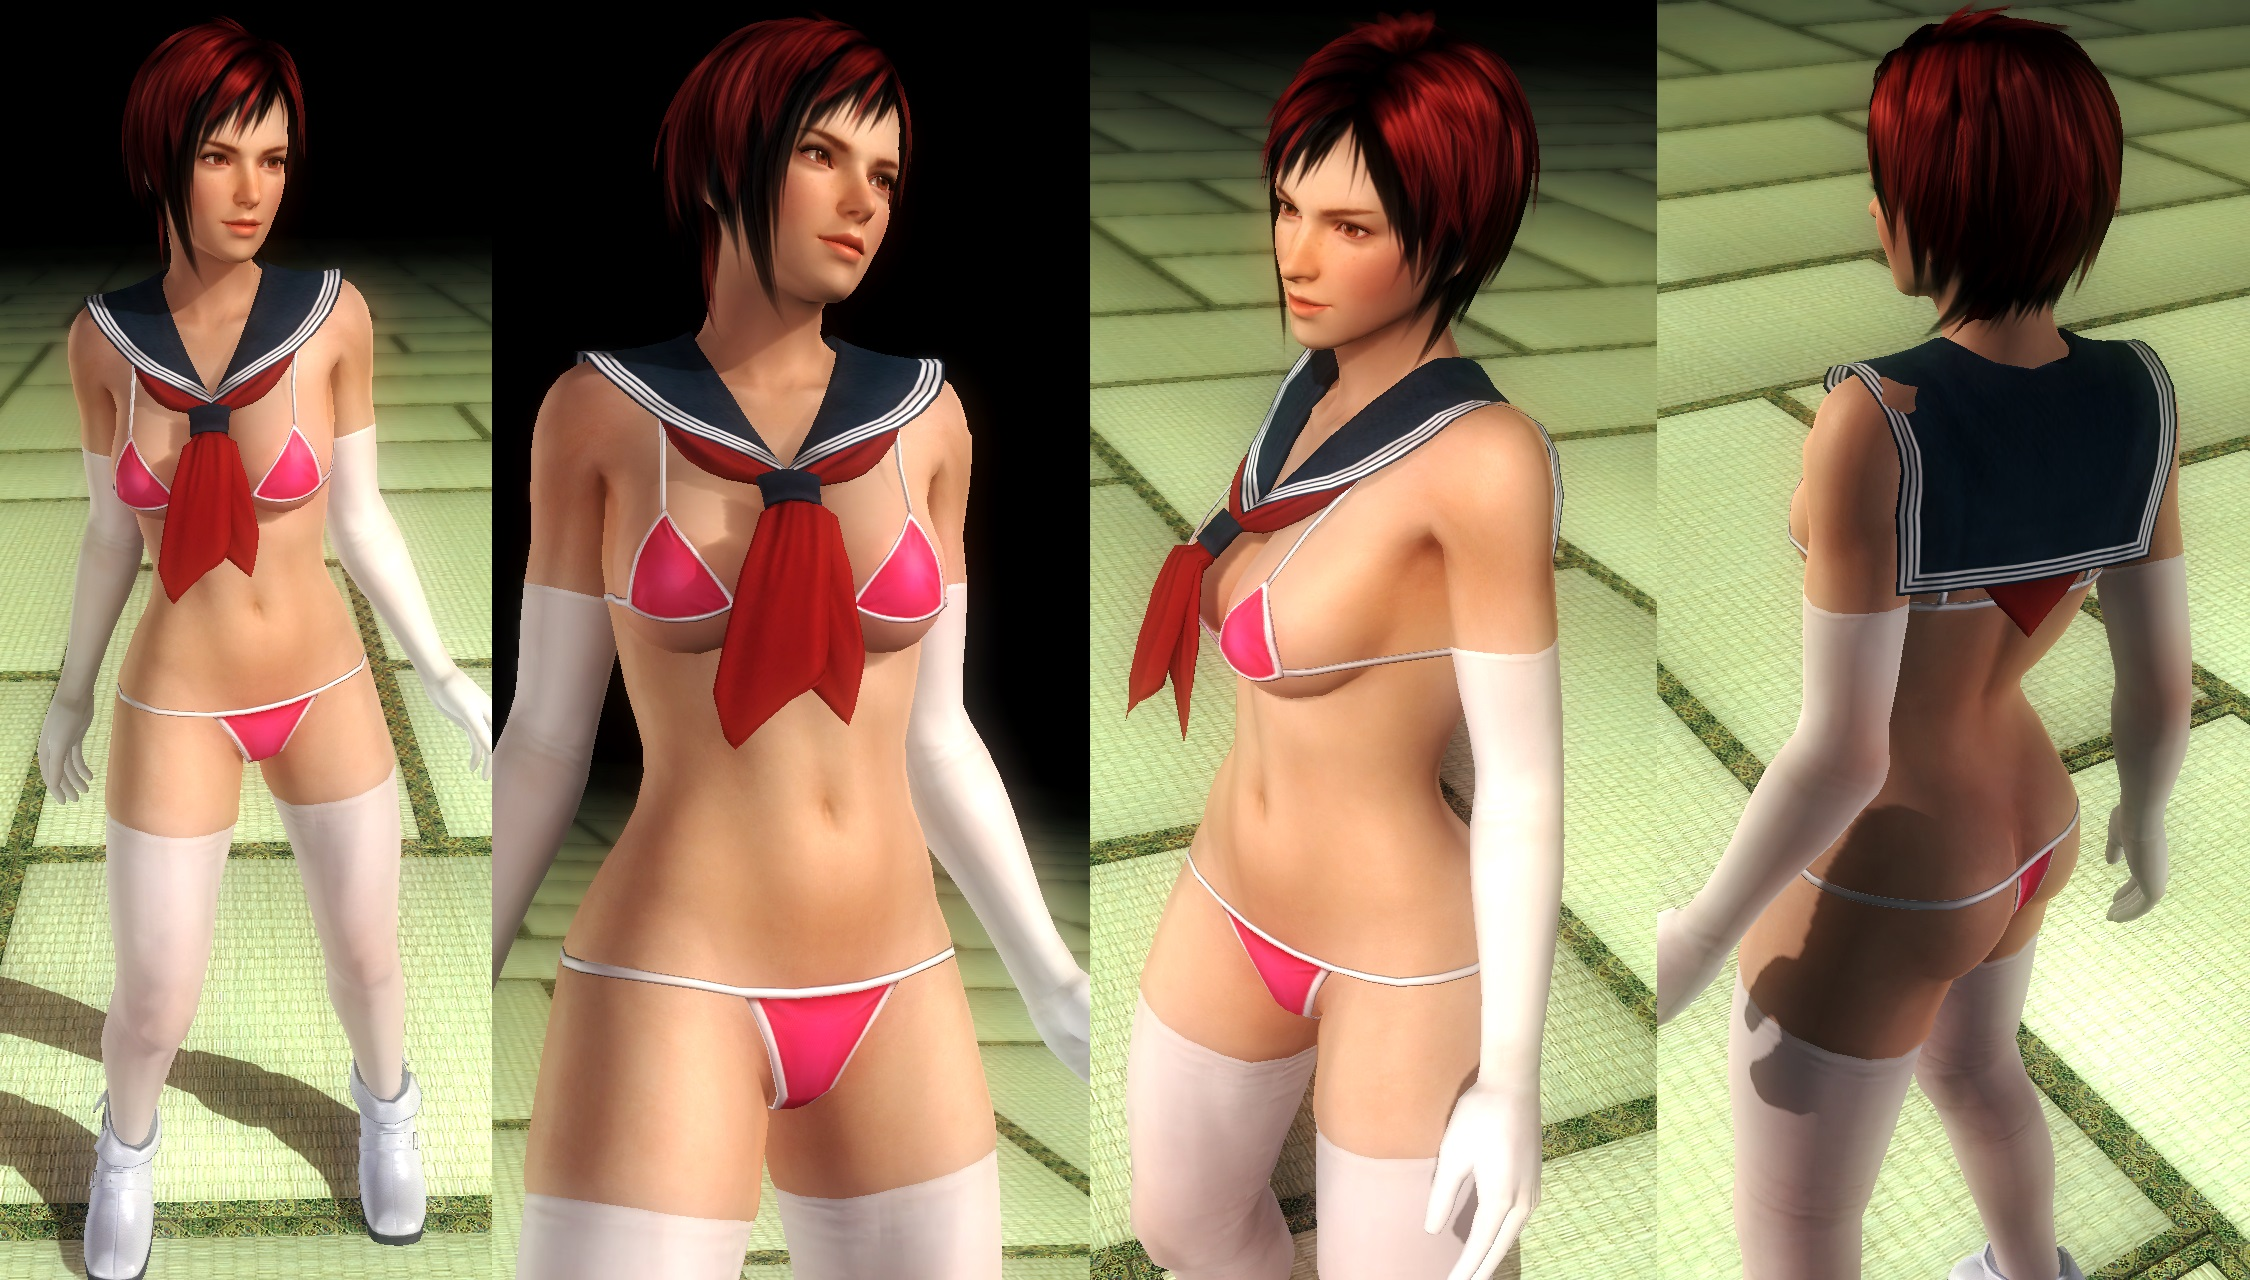 Mila bikini school by funnybunny666